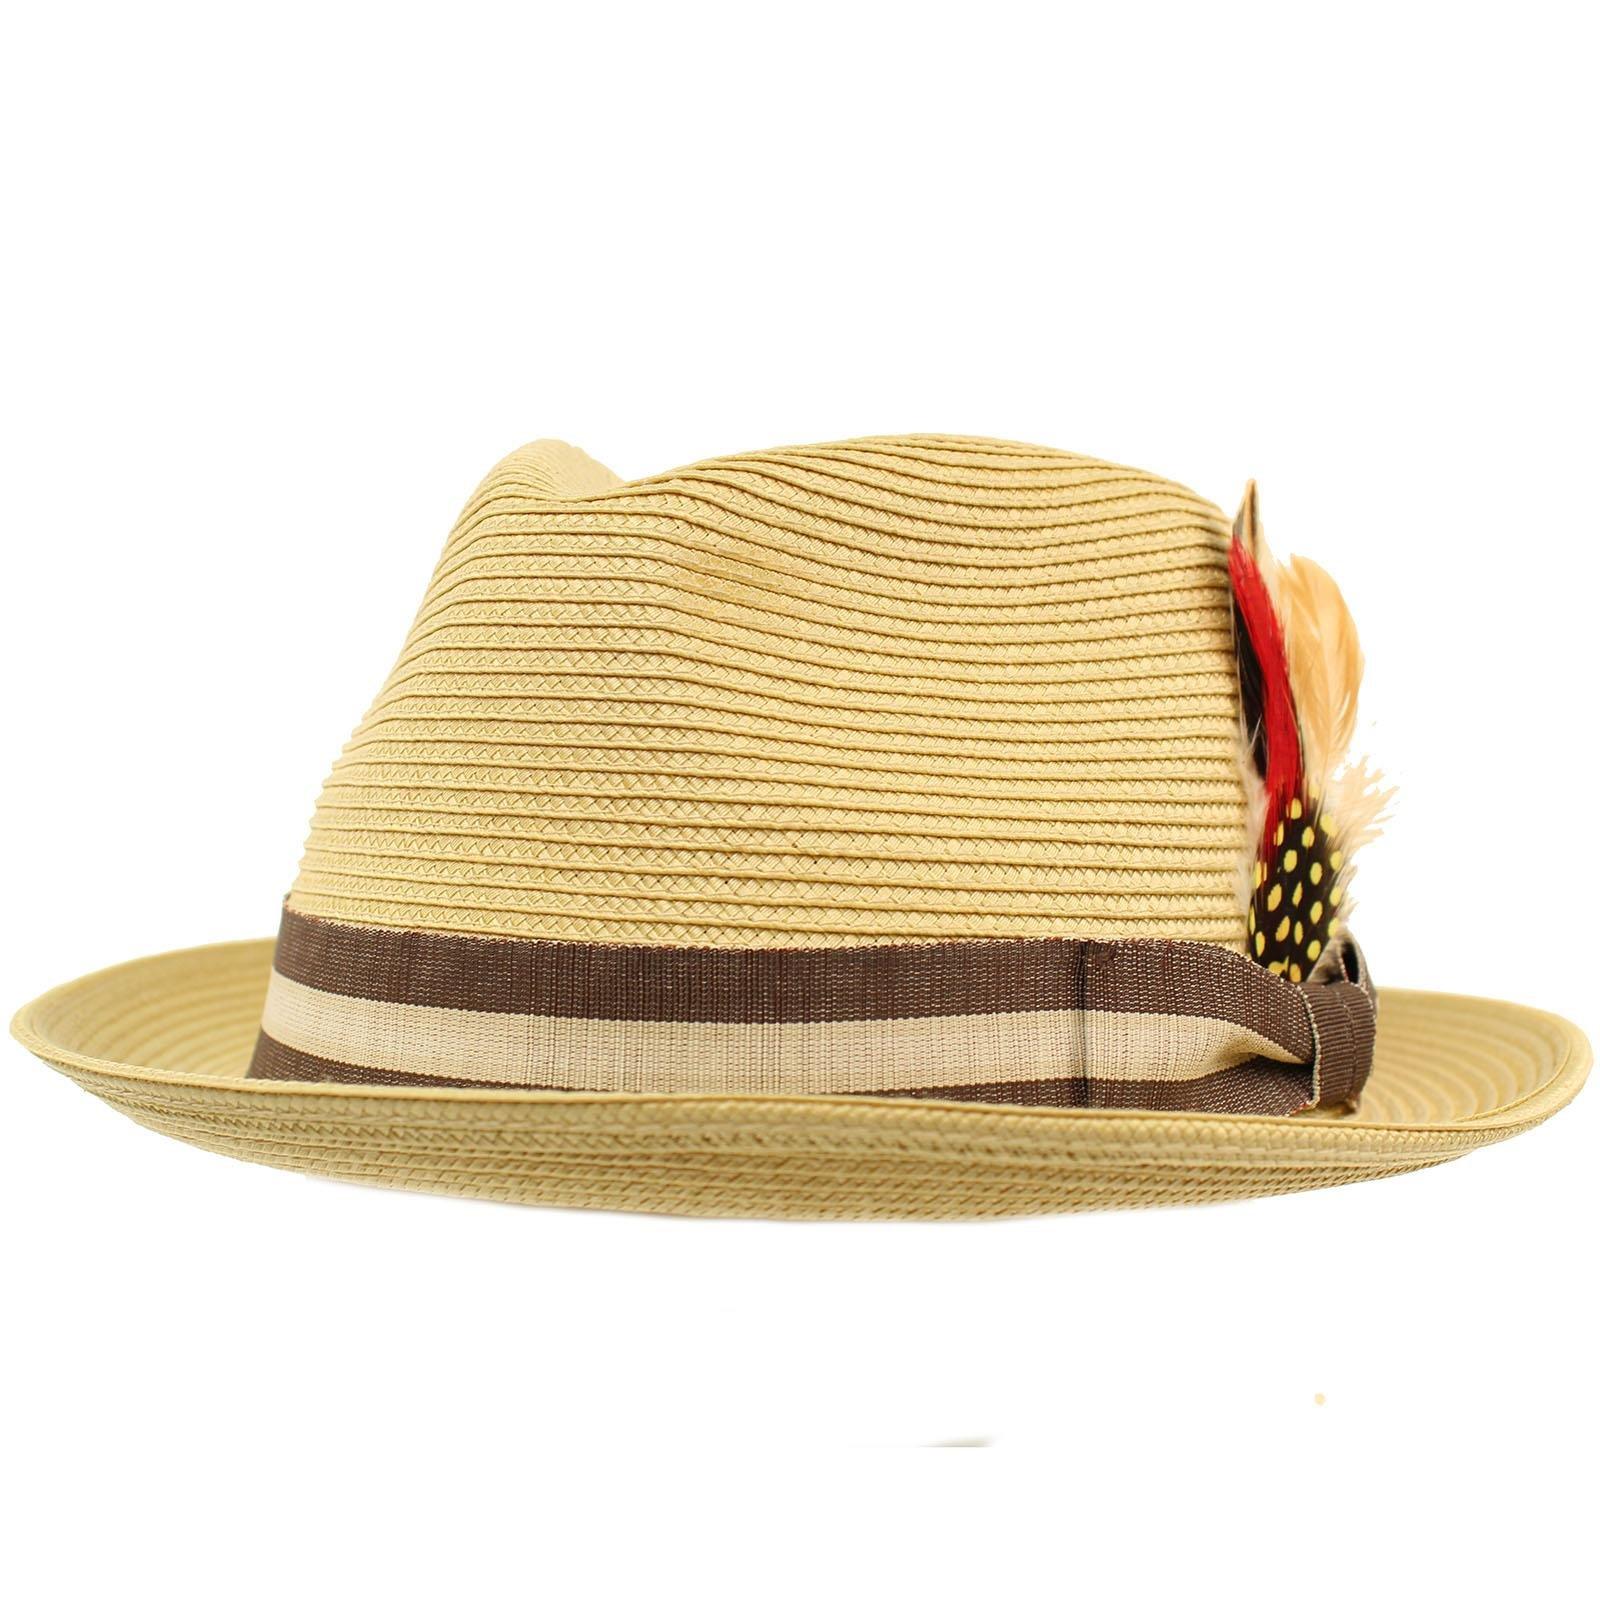 SK Hat shop Men's Stripe Band Removable Feather Derby Fedora Curled Brim Hat L/XL